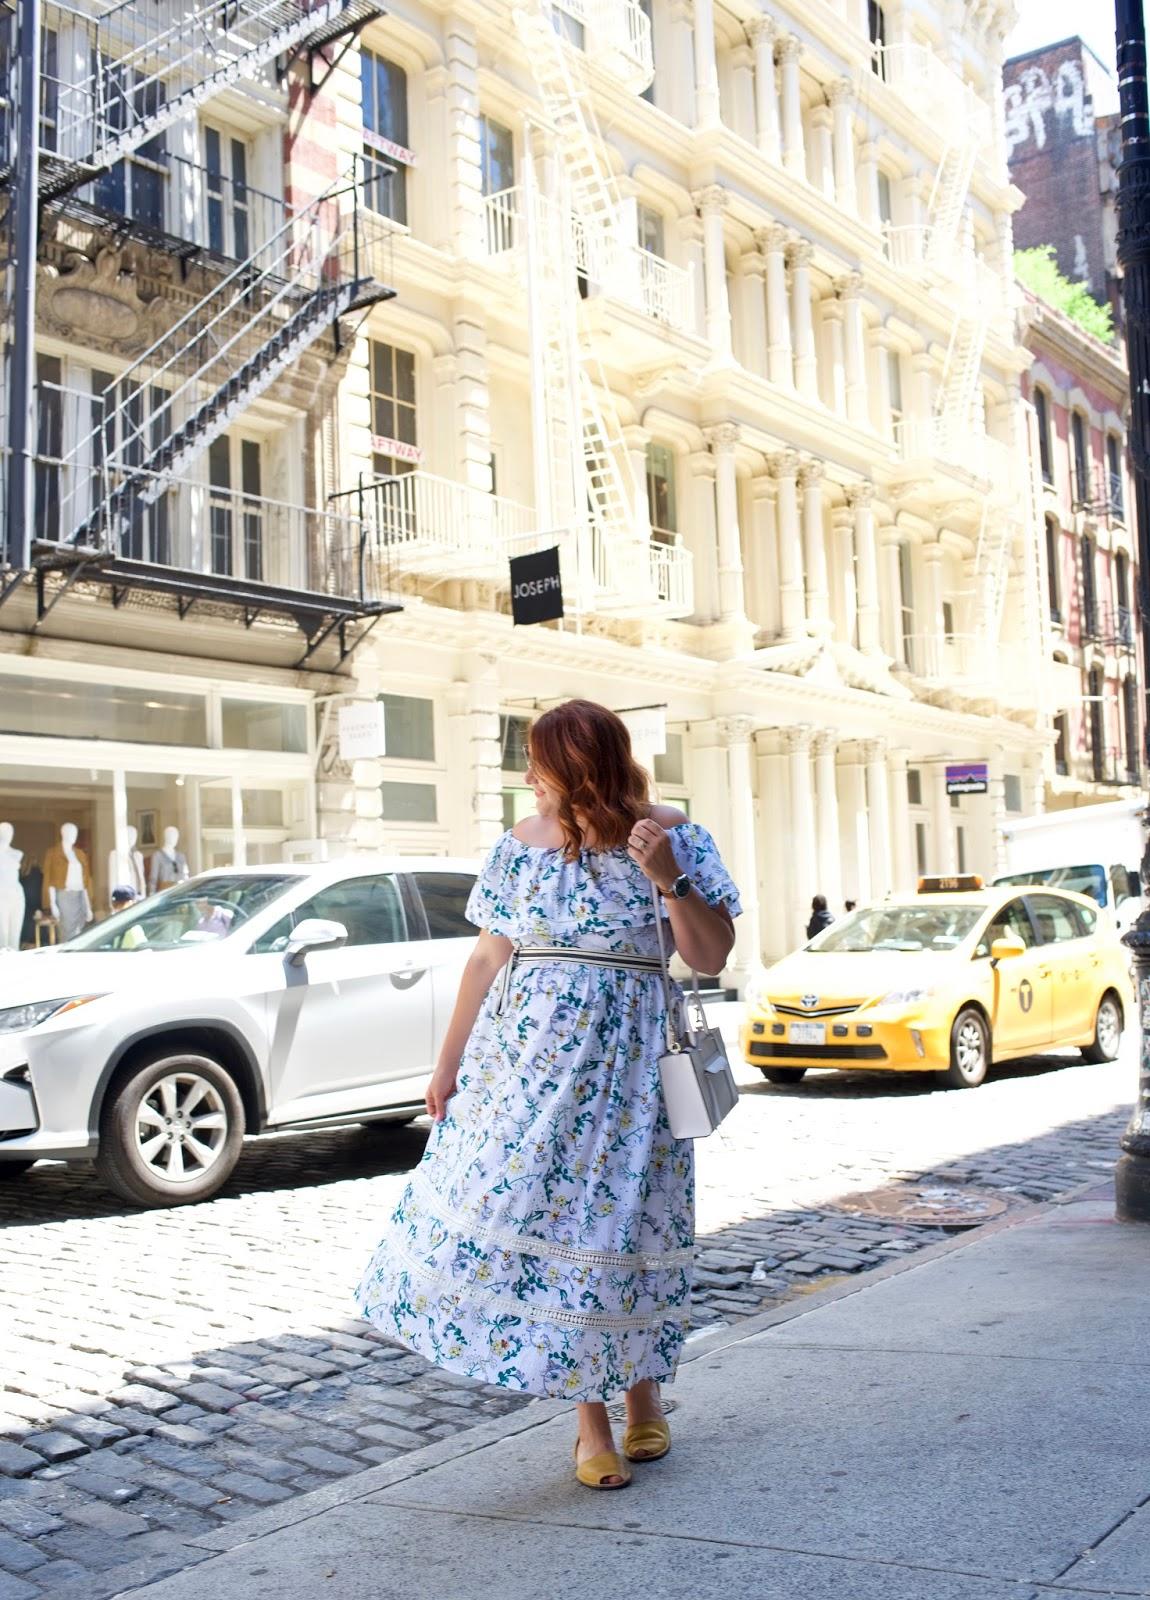 Asos midi dress, summer outfit, twos company hat, pons sandals, mini Mab rebecca minkoff, soho streets